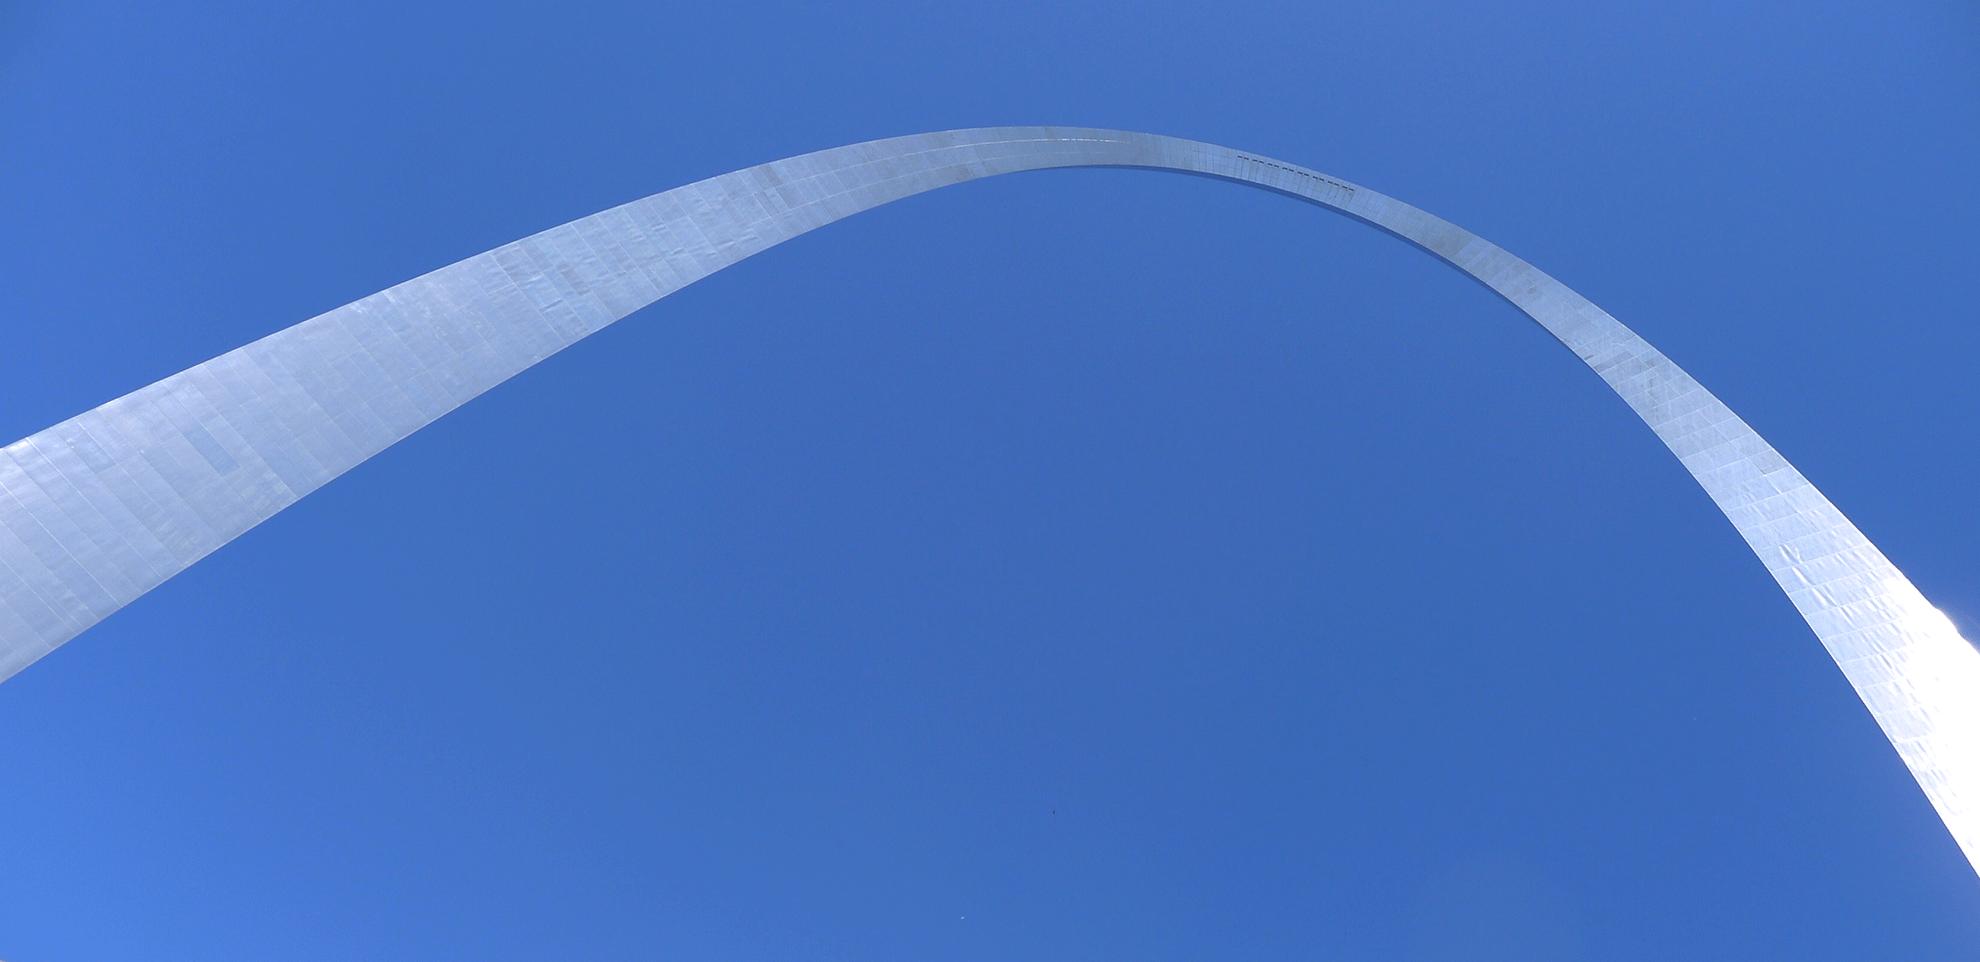 Gateway arch from below.